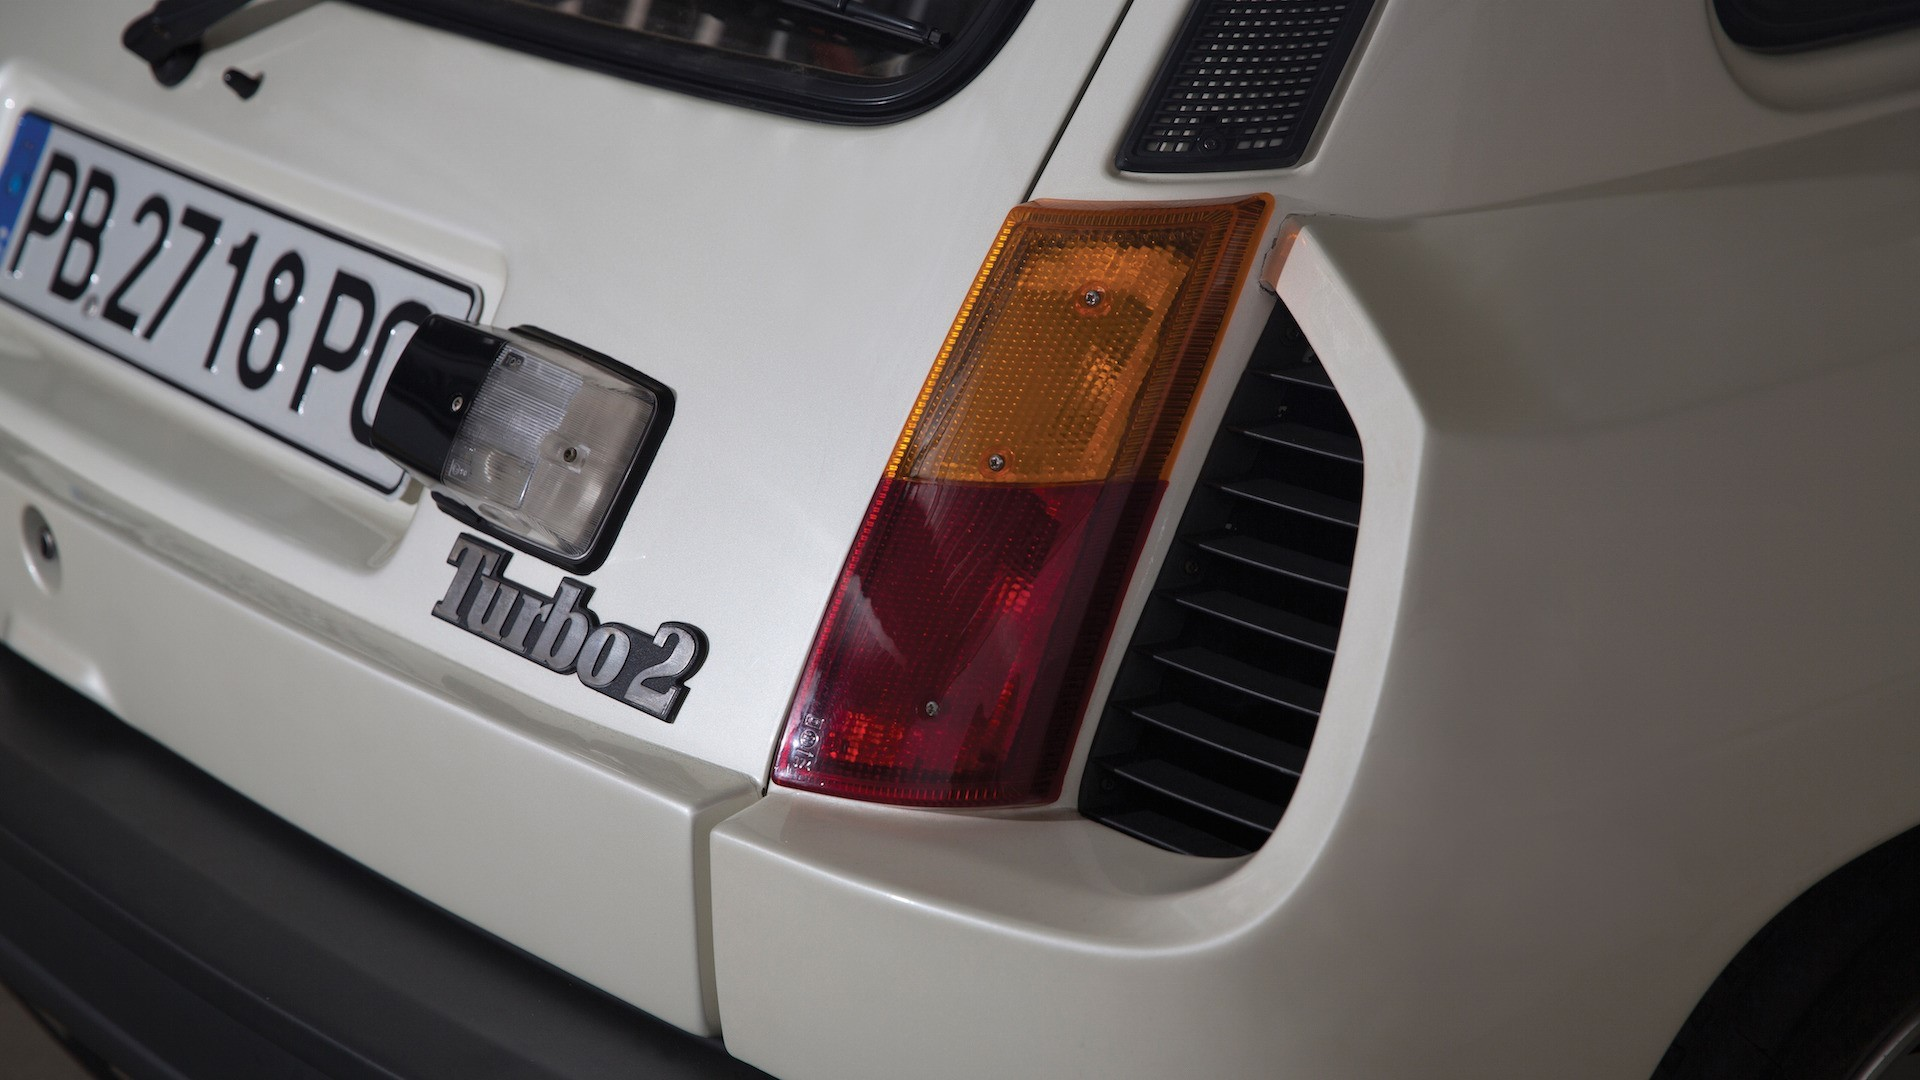 1983-renault-5-turbo-ii-auction (10)